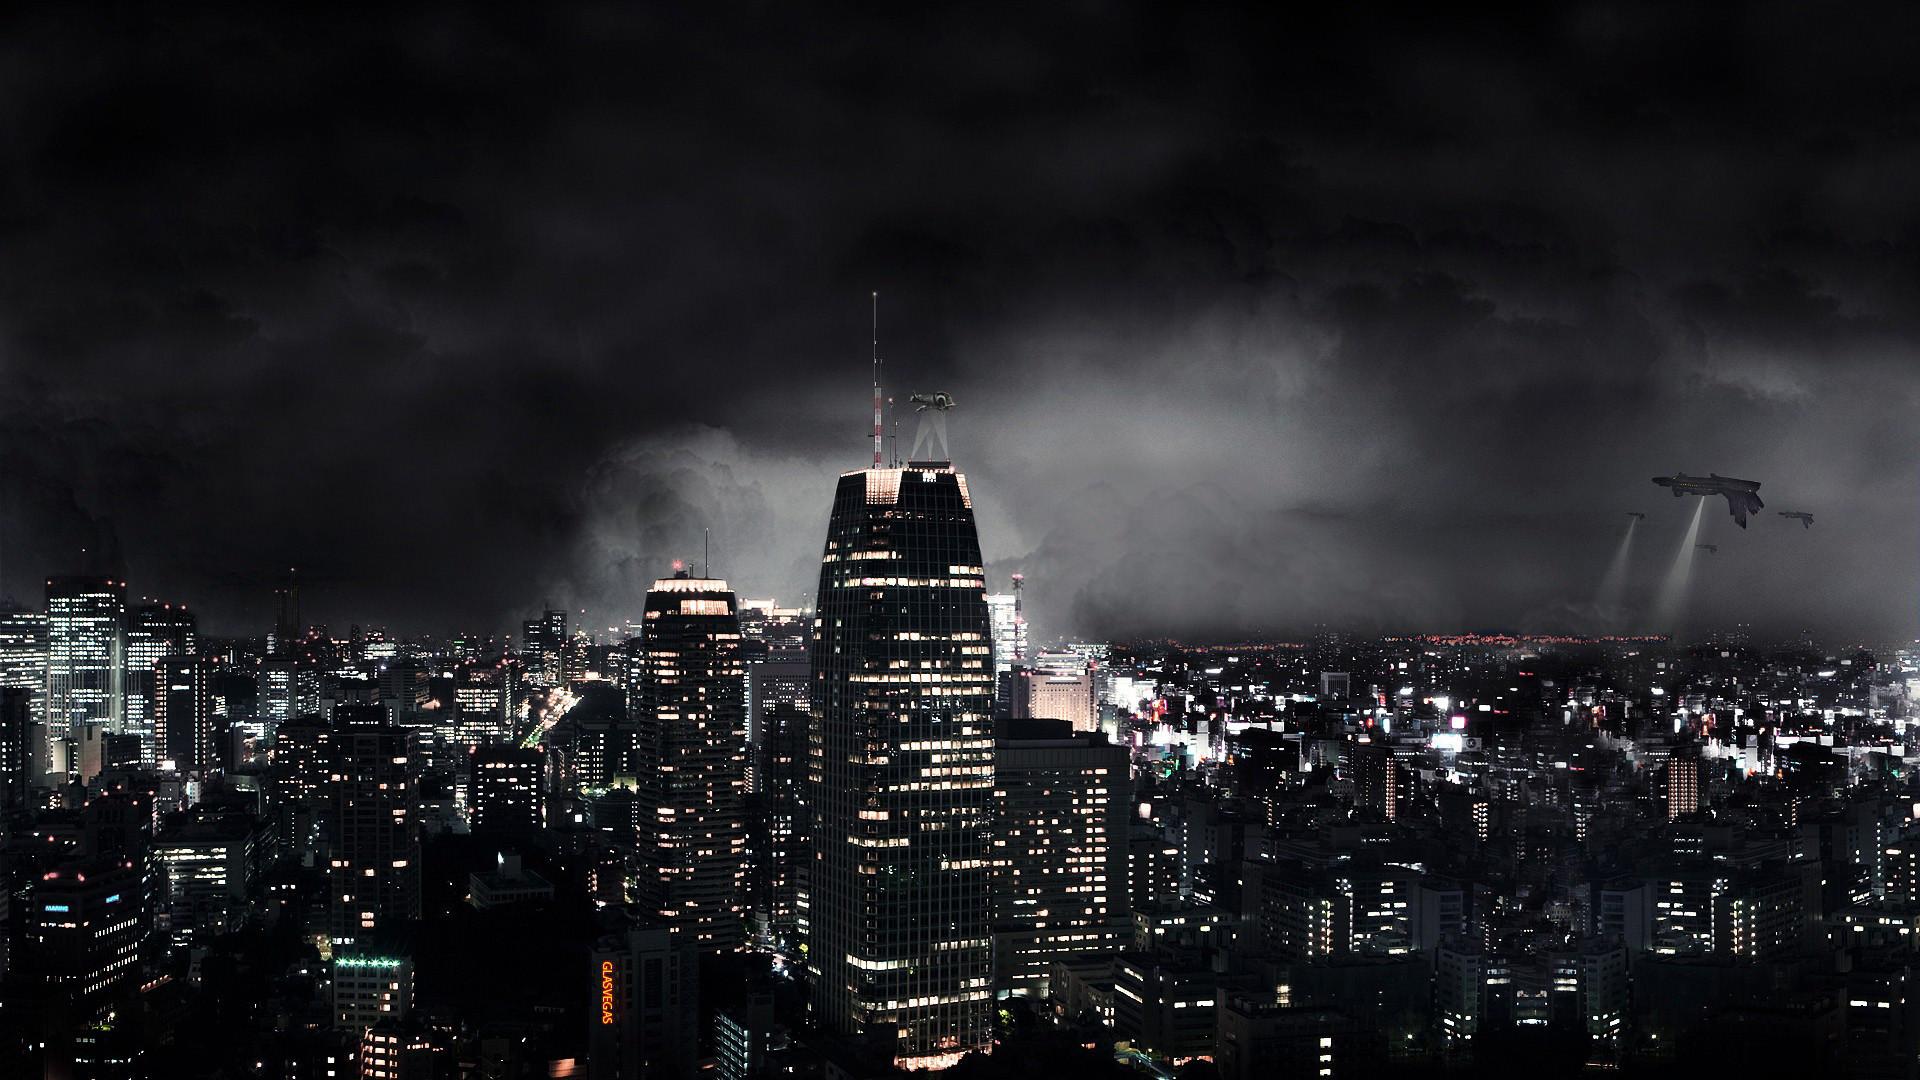 Dark Abstract City